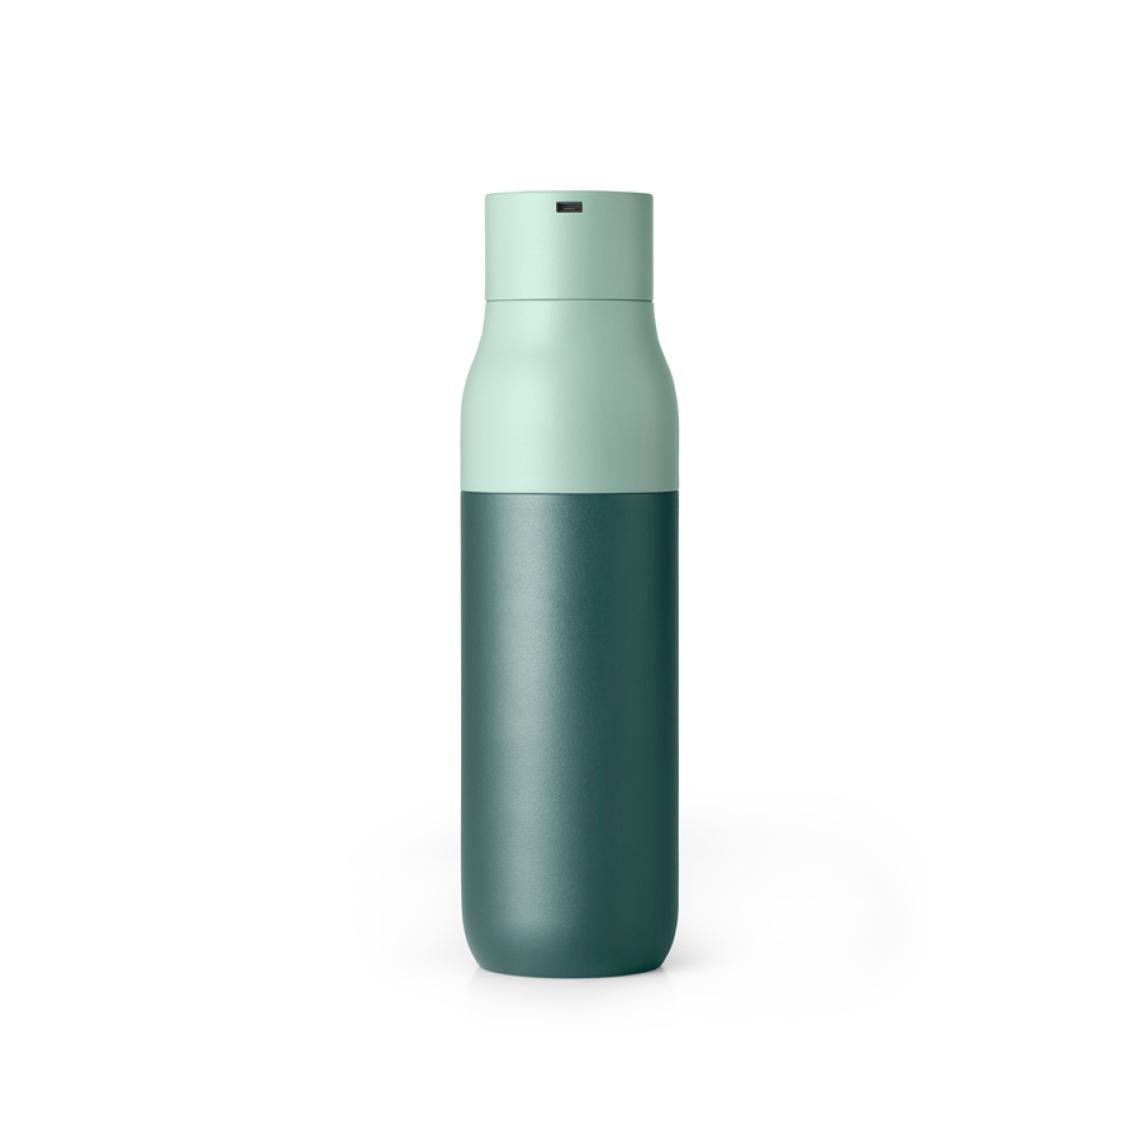 LARQ Bottle PureVis - Eucalyptus Green